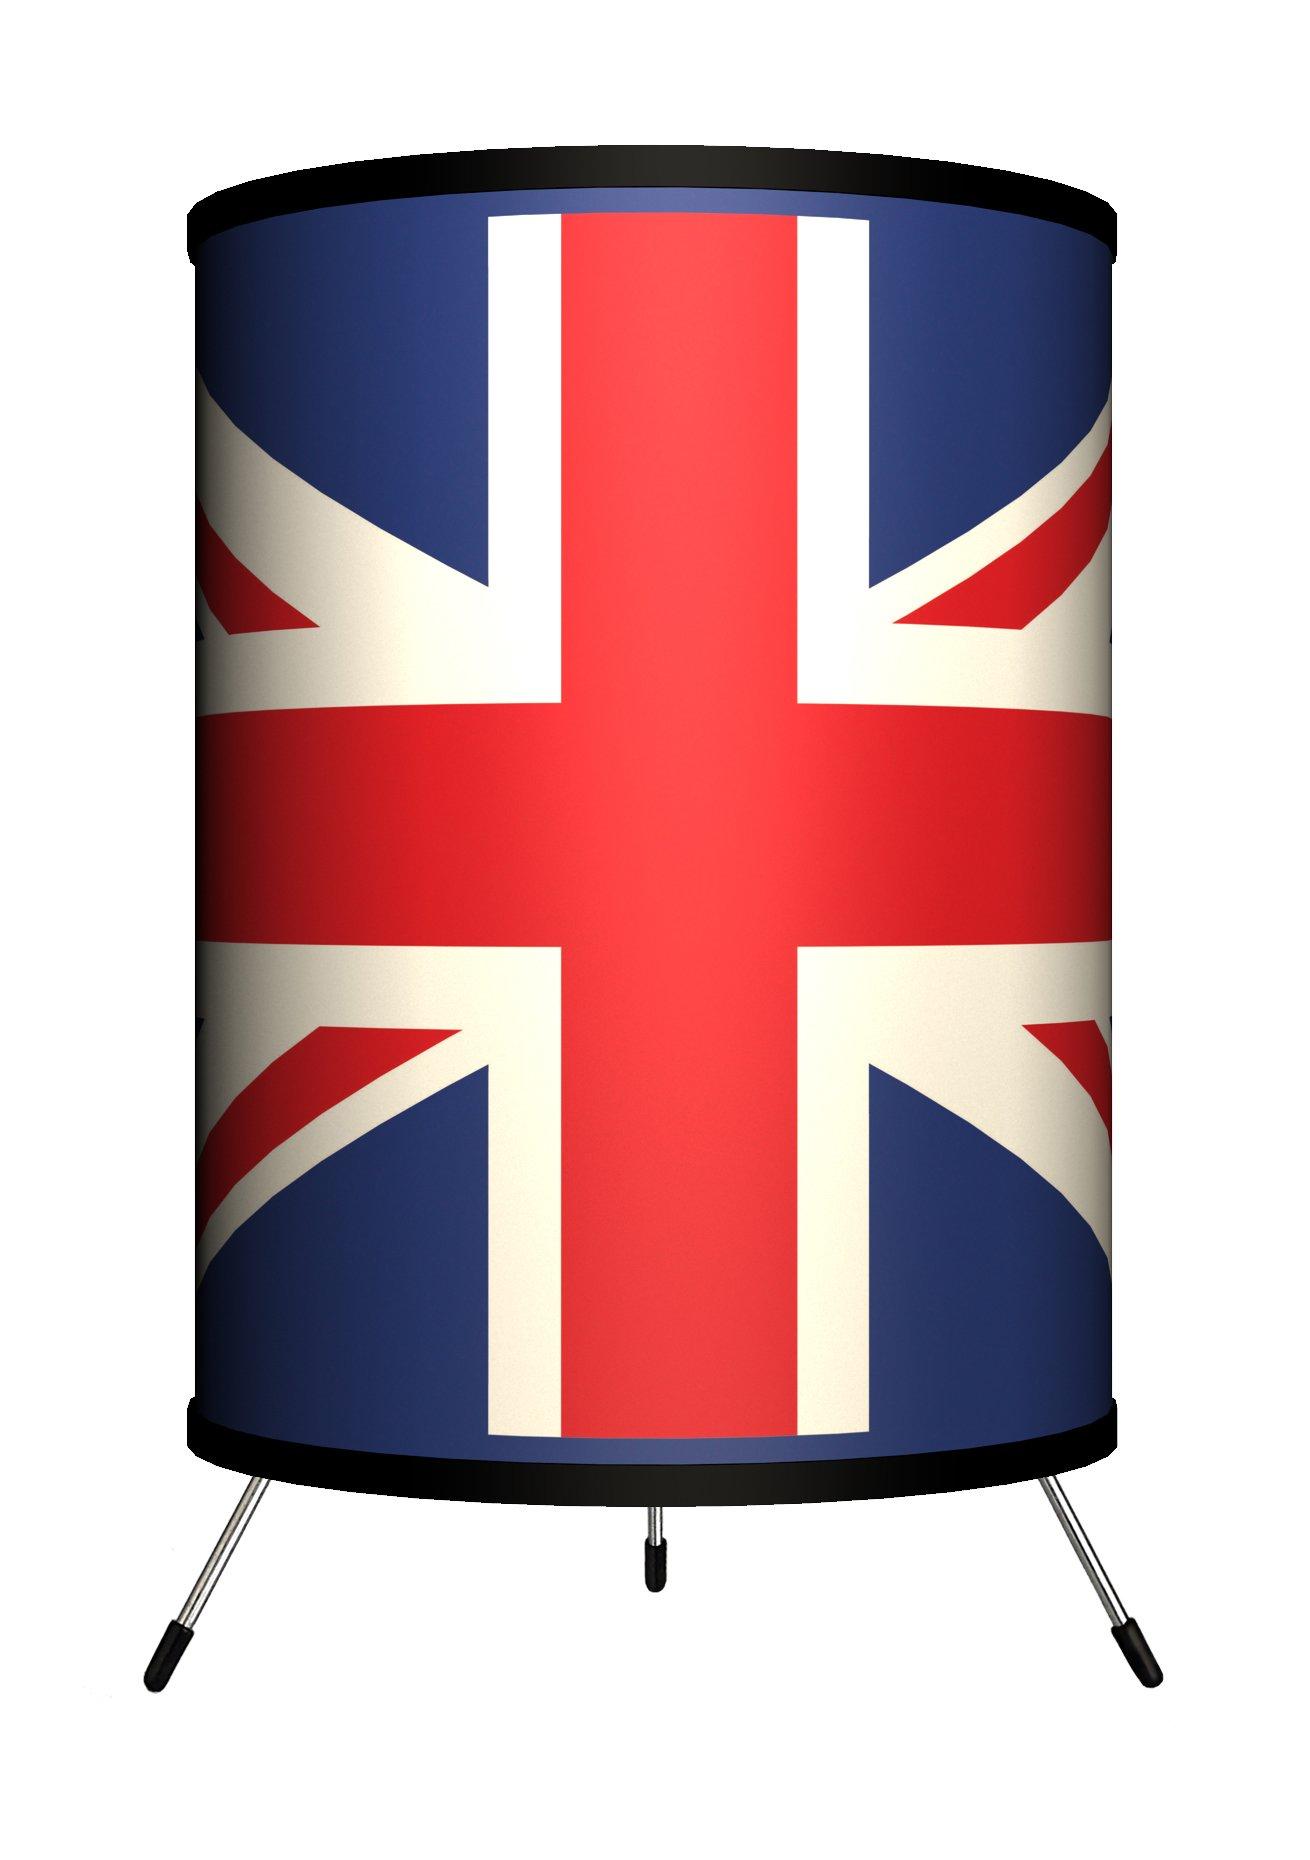 Lamp-In-A-Box TRI-TRV-UNION Travel - Union Jack Tripod Lamp, 8'' x 8'' x 14''